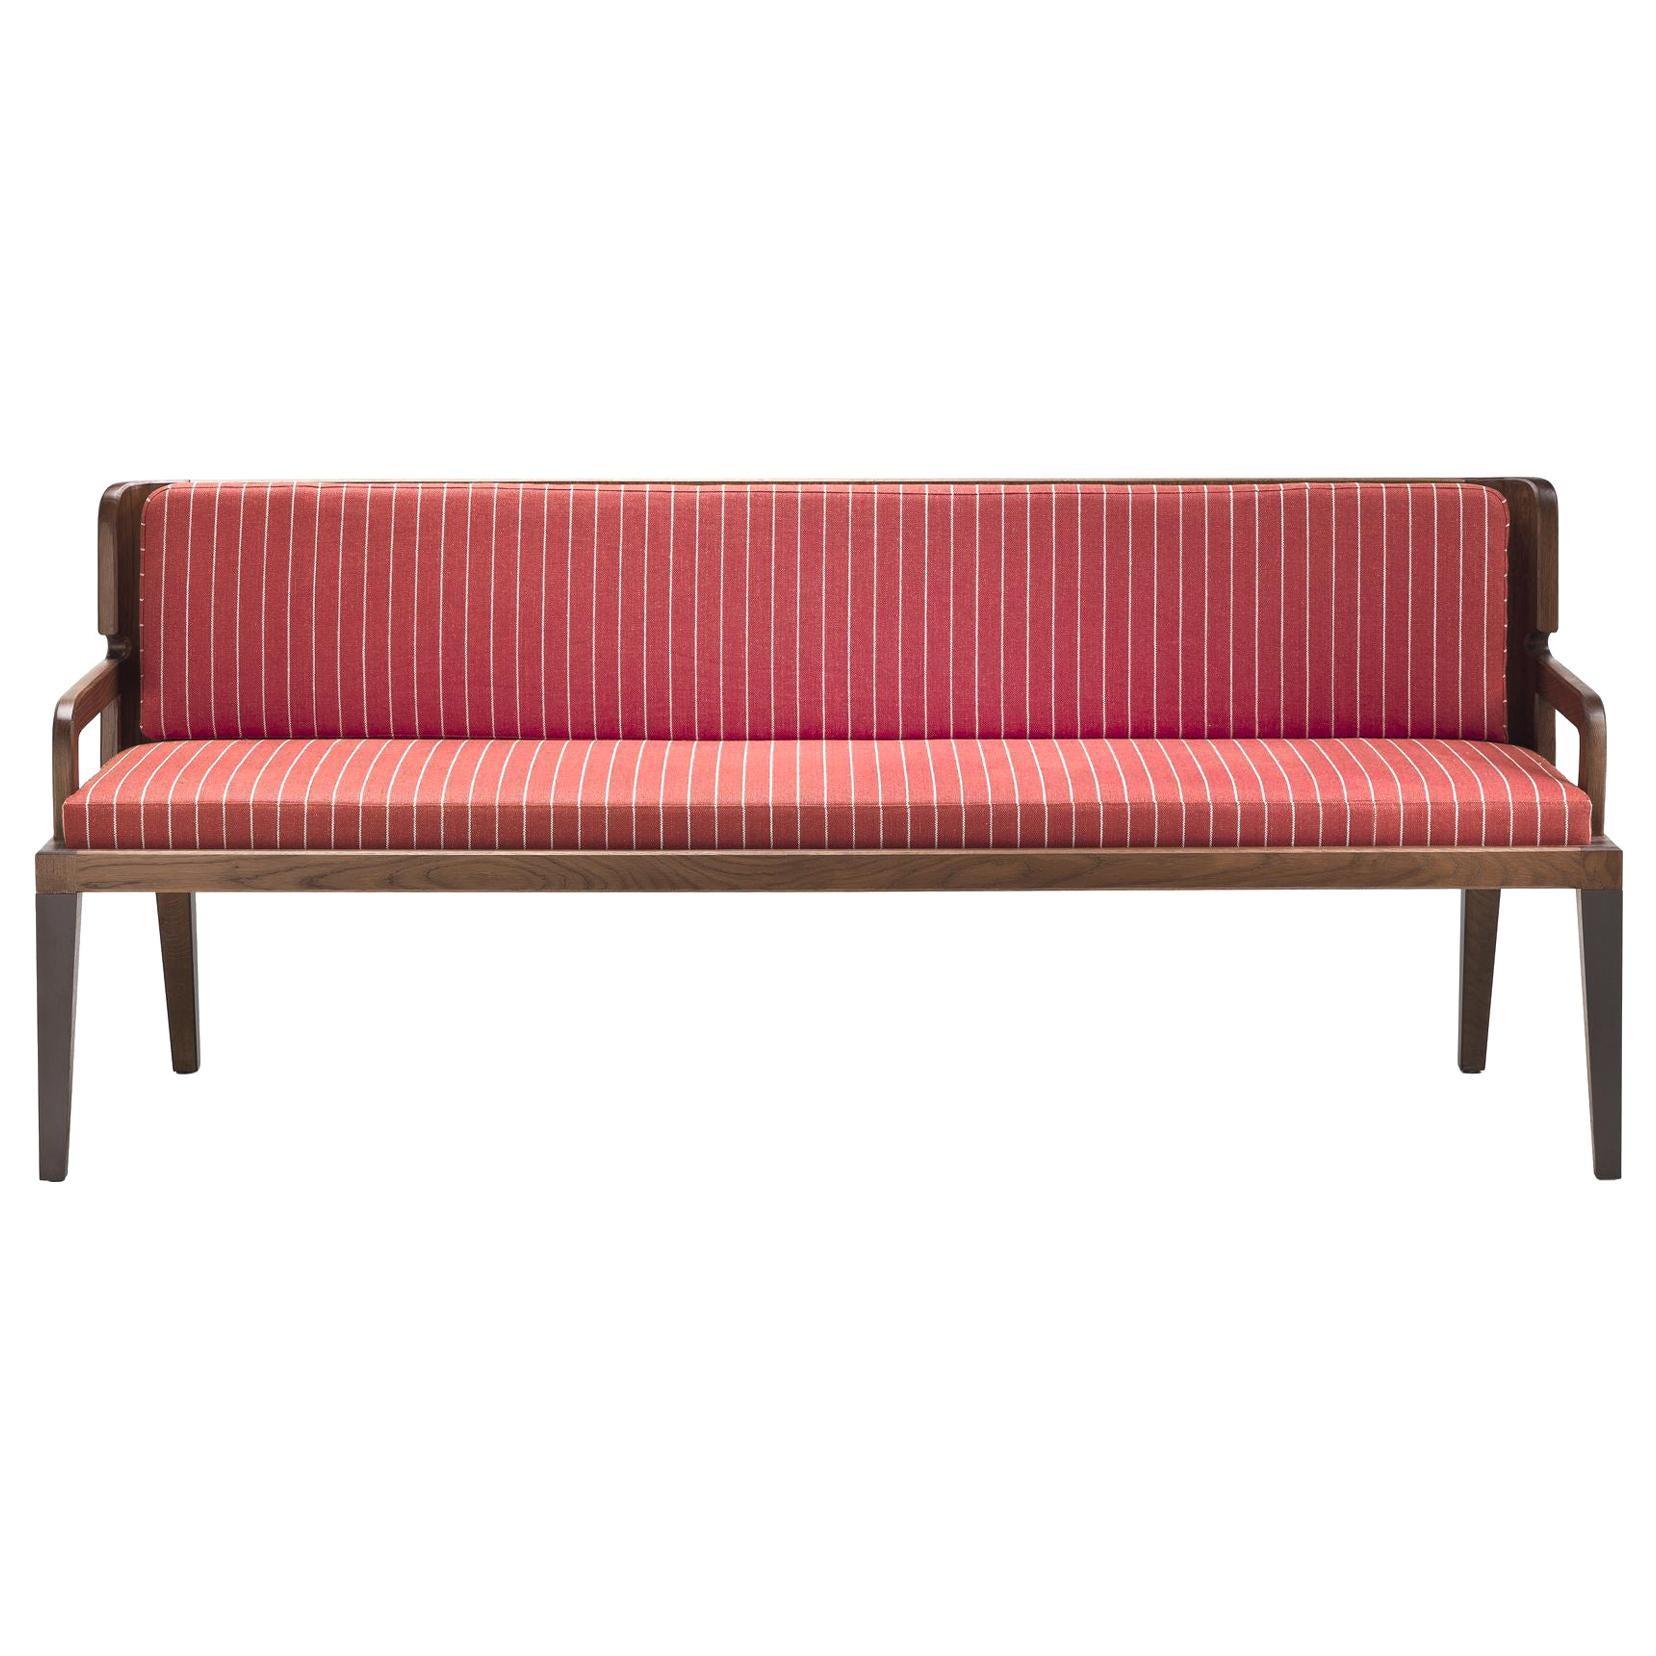 Bulle Small Sofa in Solid Oak